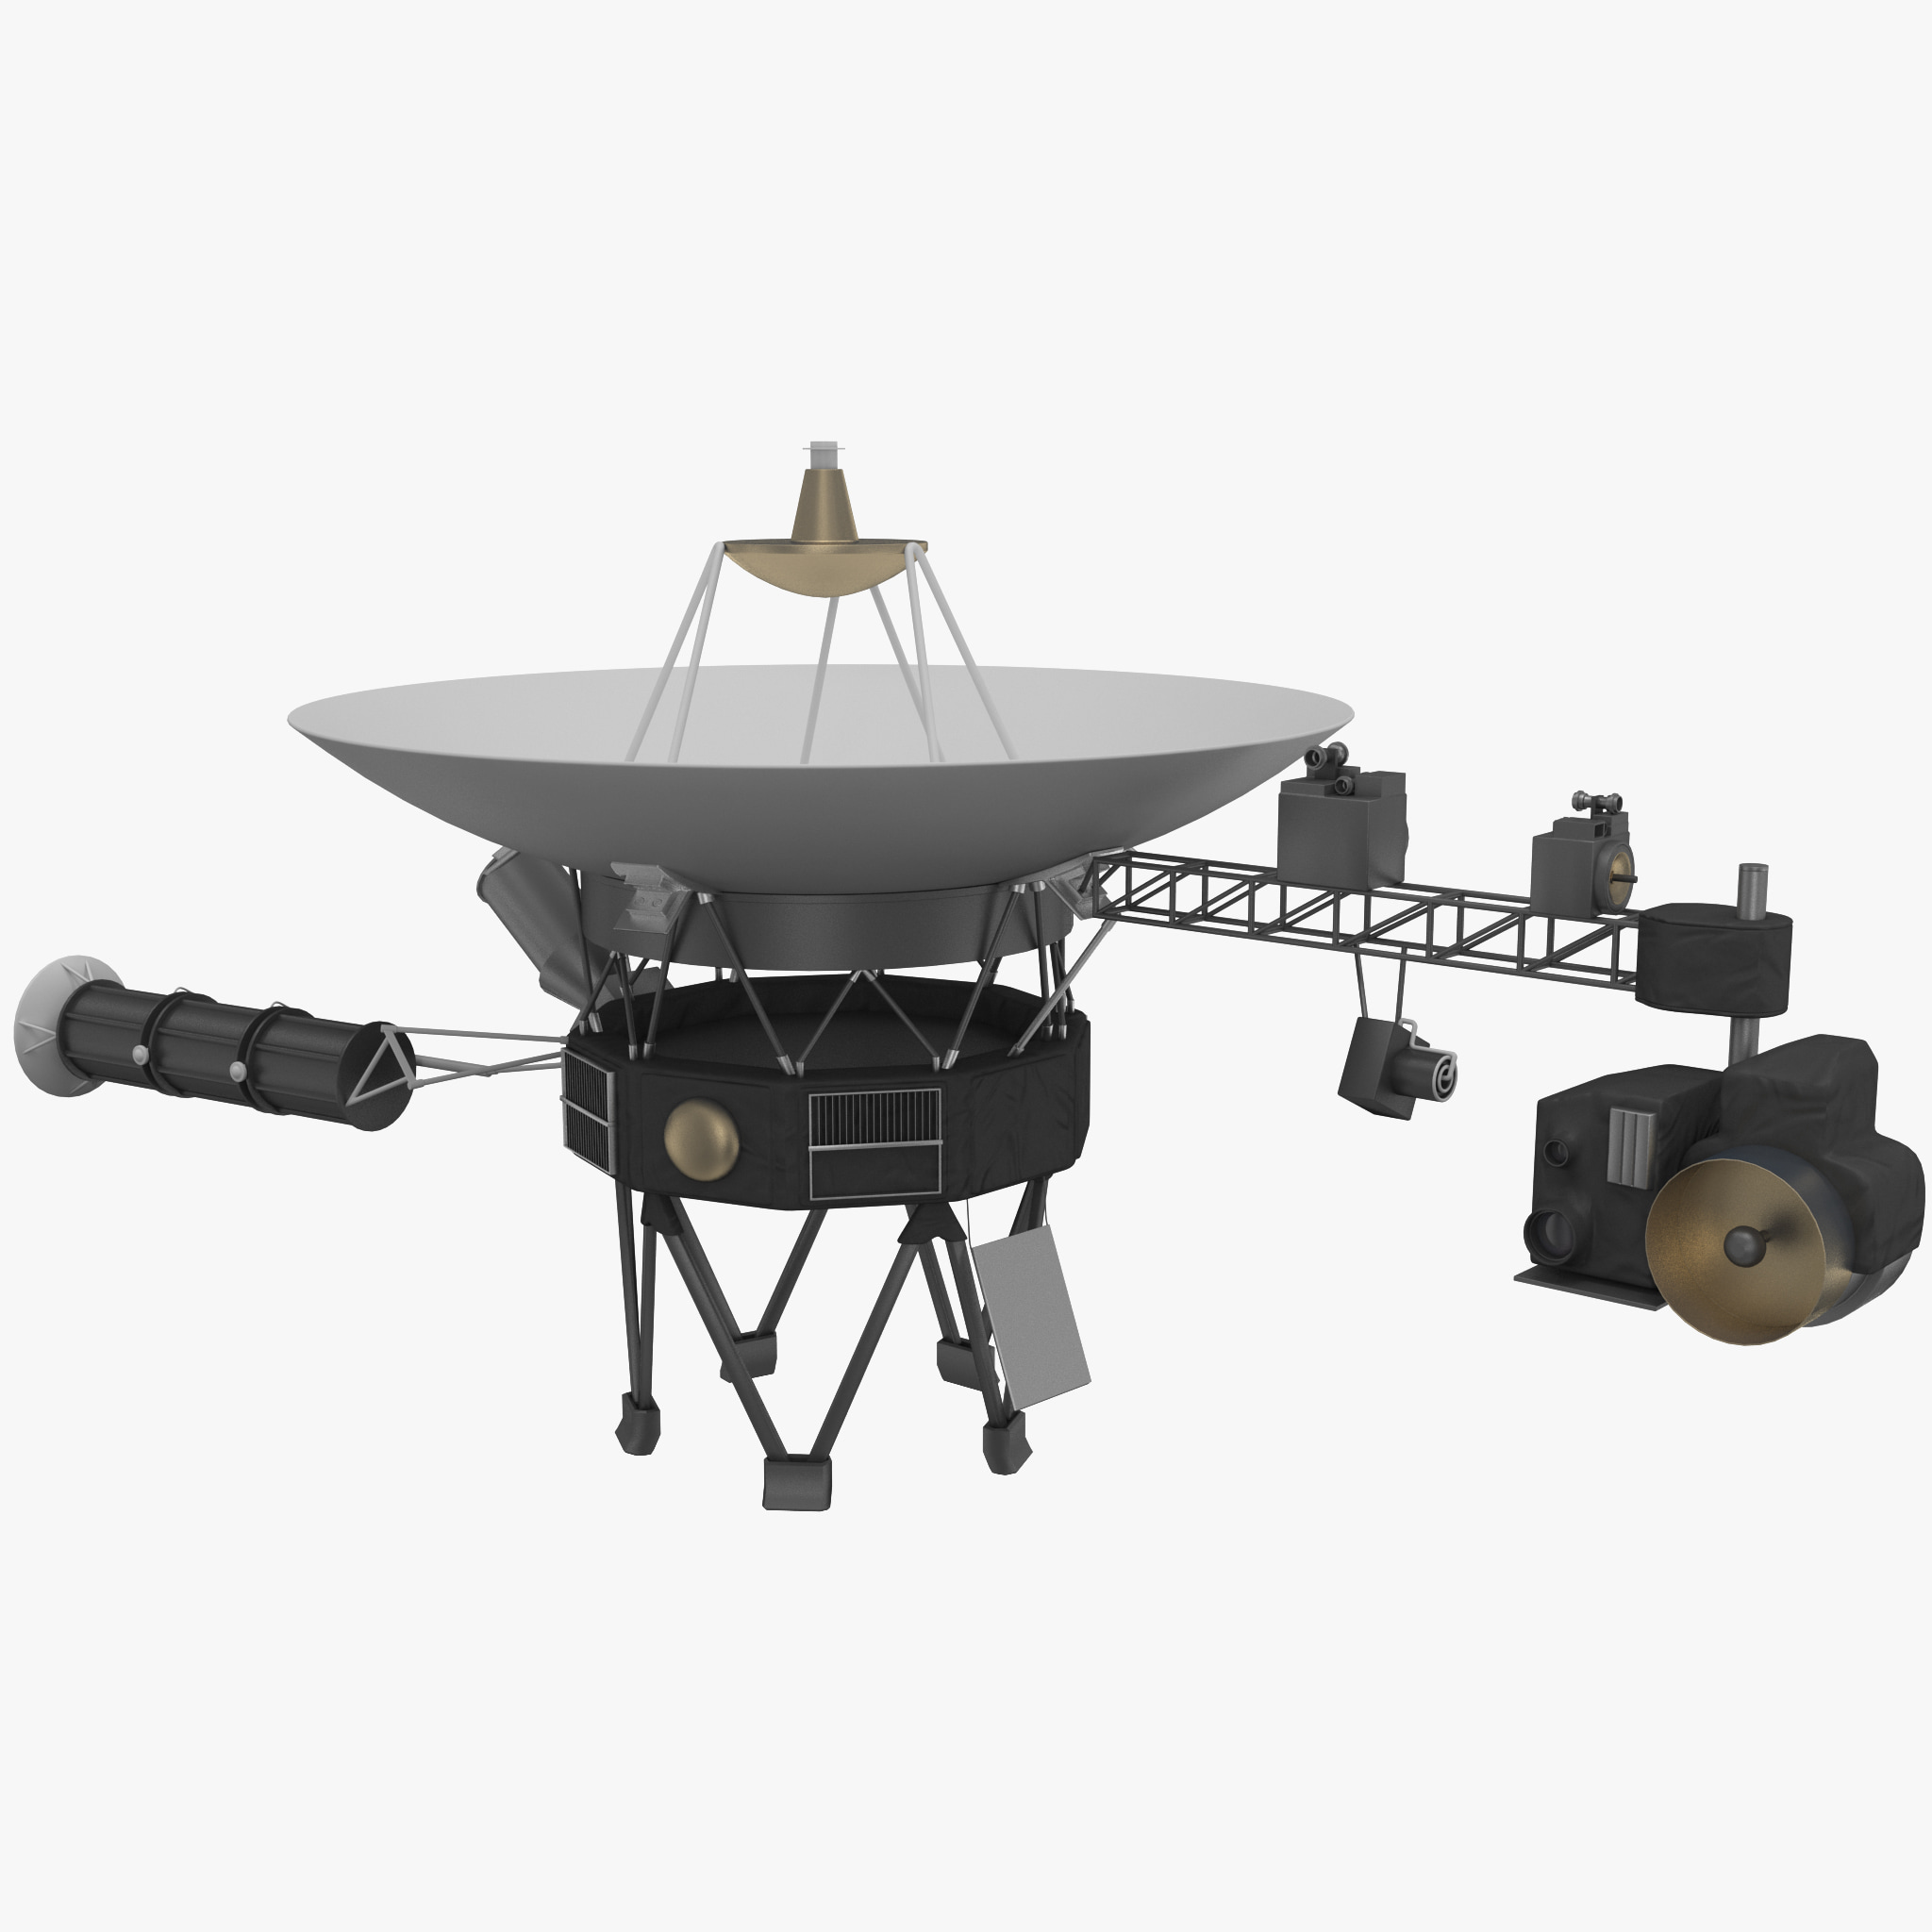 space probe models - photo #24